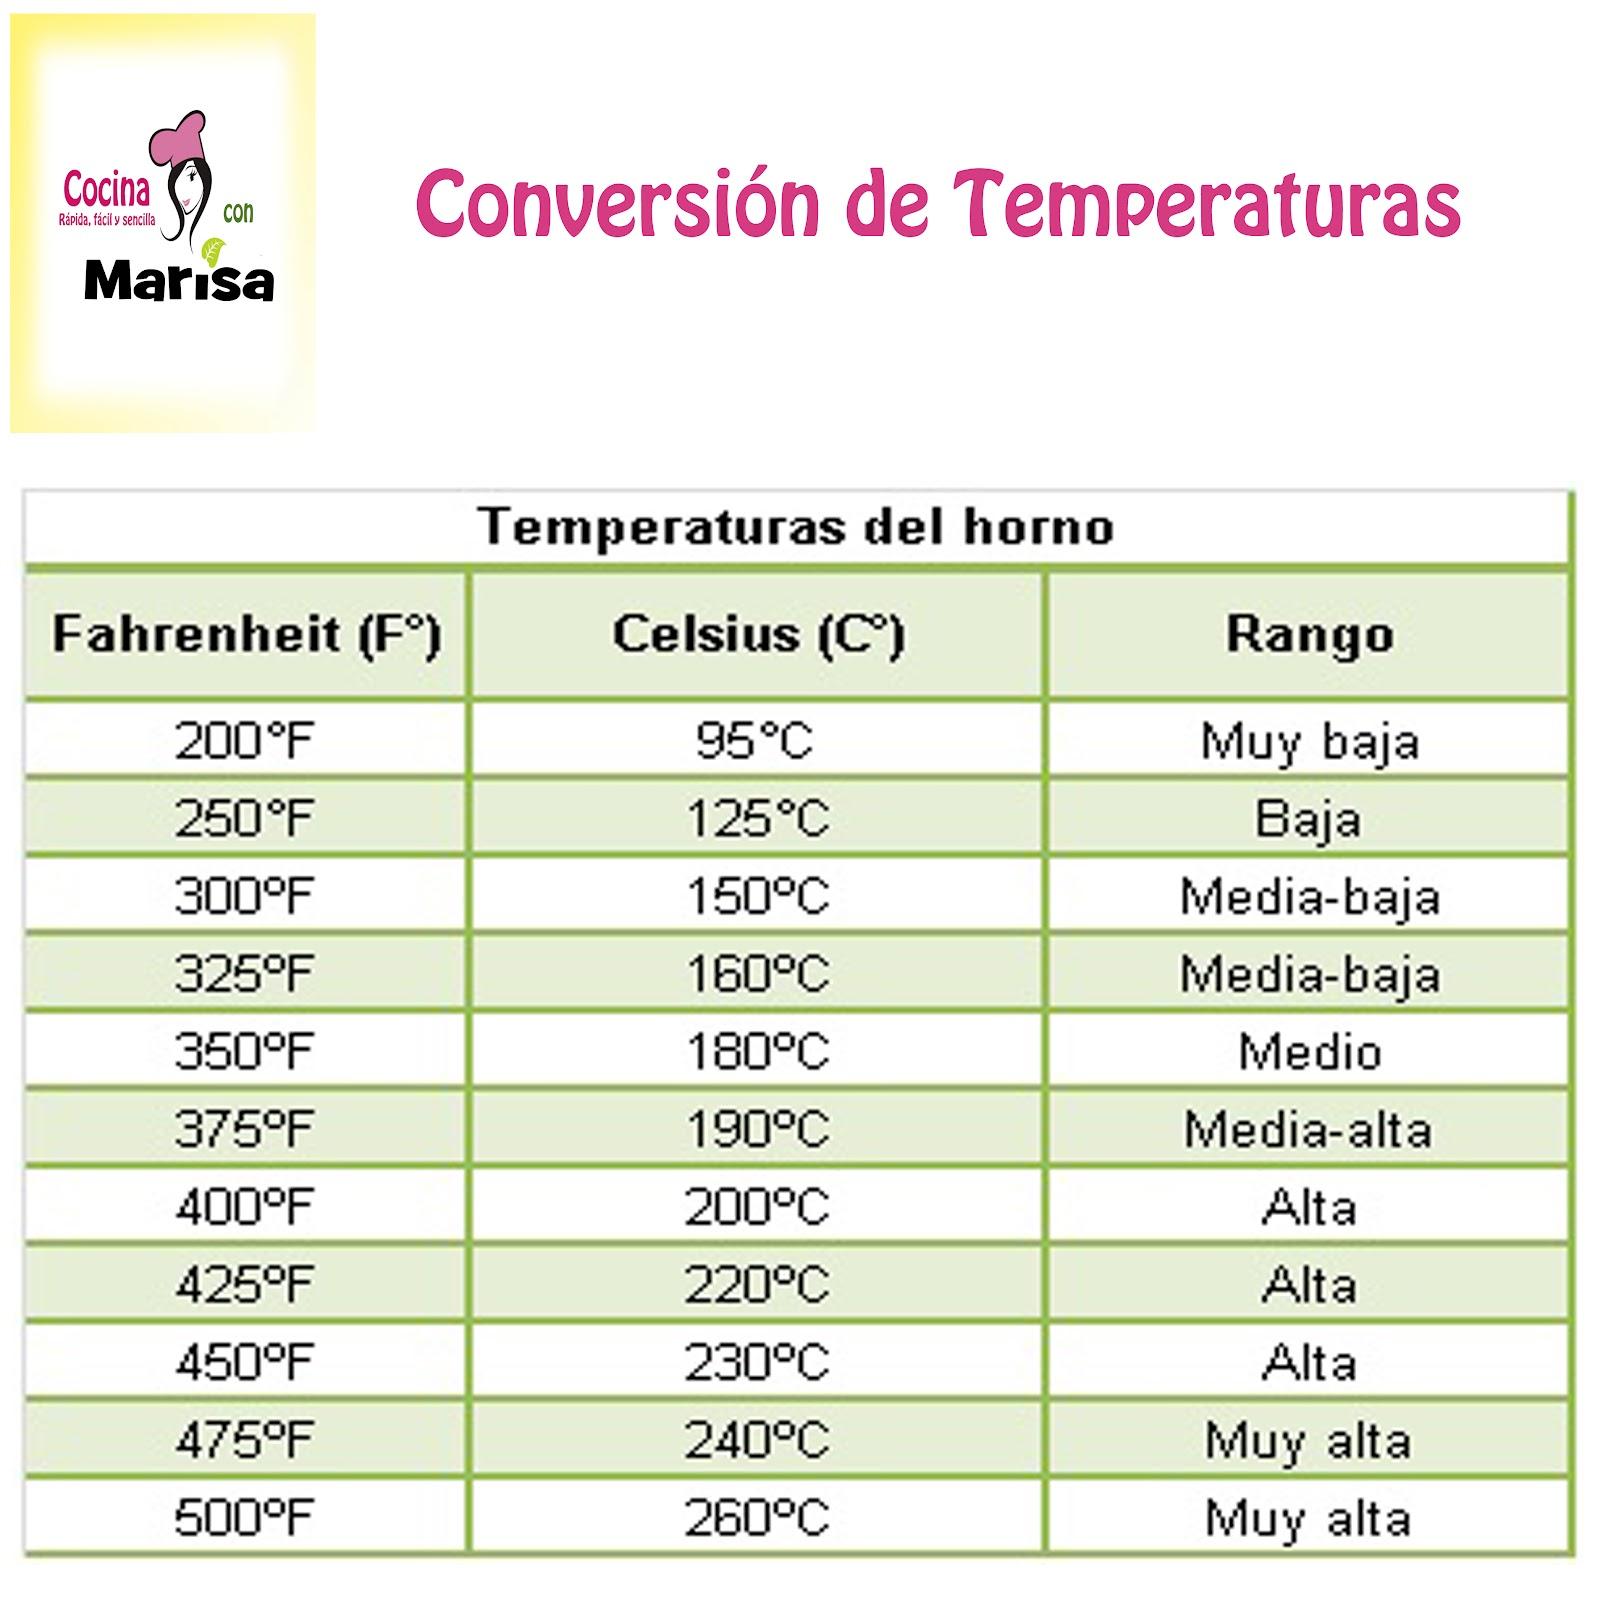 Como convertir celsius a fahrenheit for 0 kelvin to fahrenheit conversion table